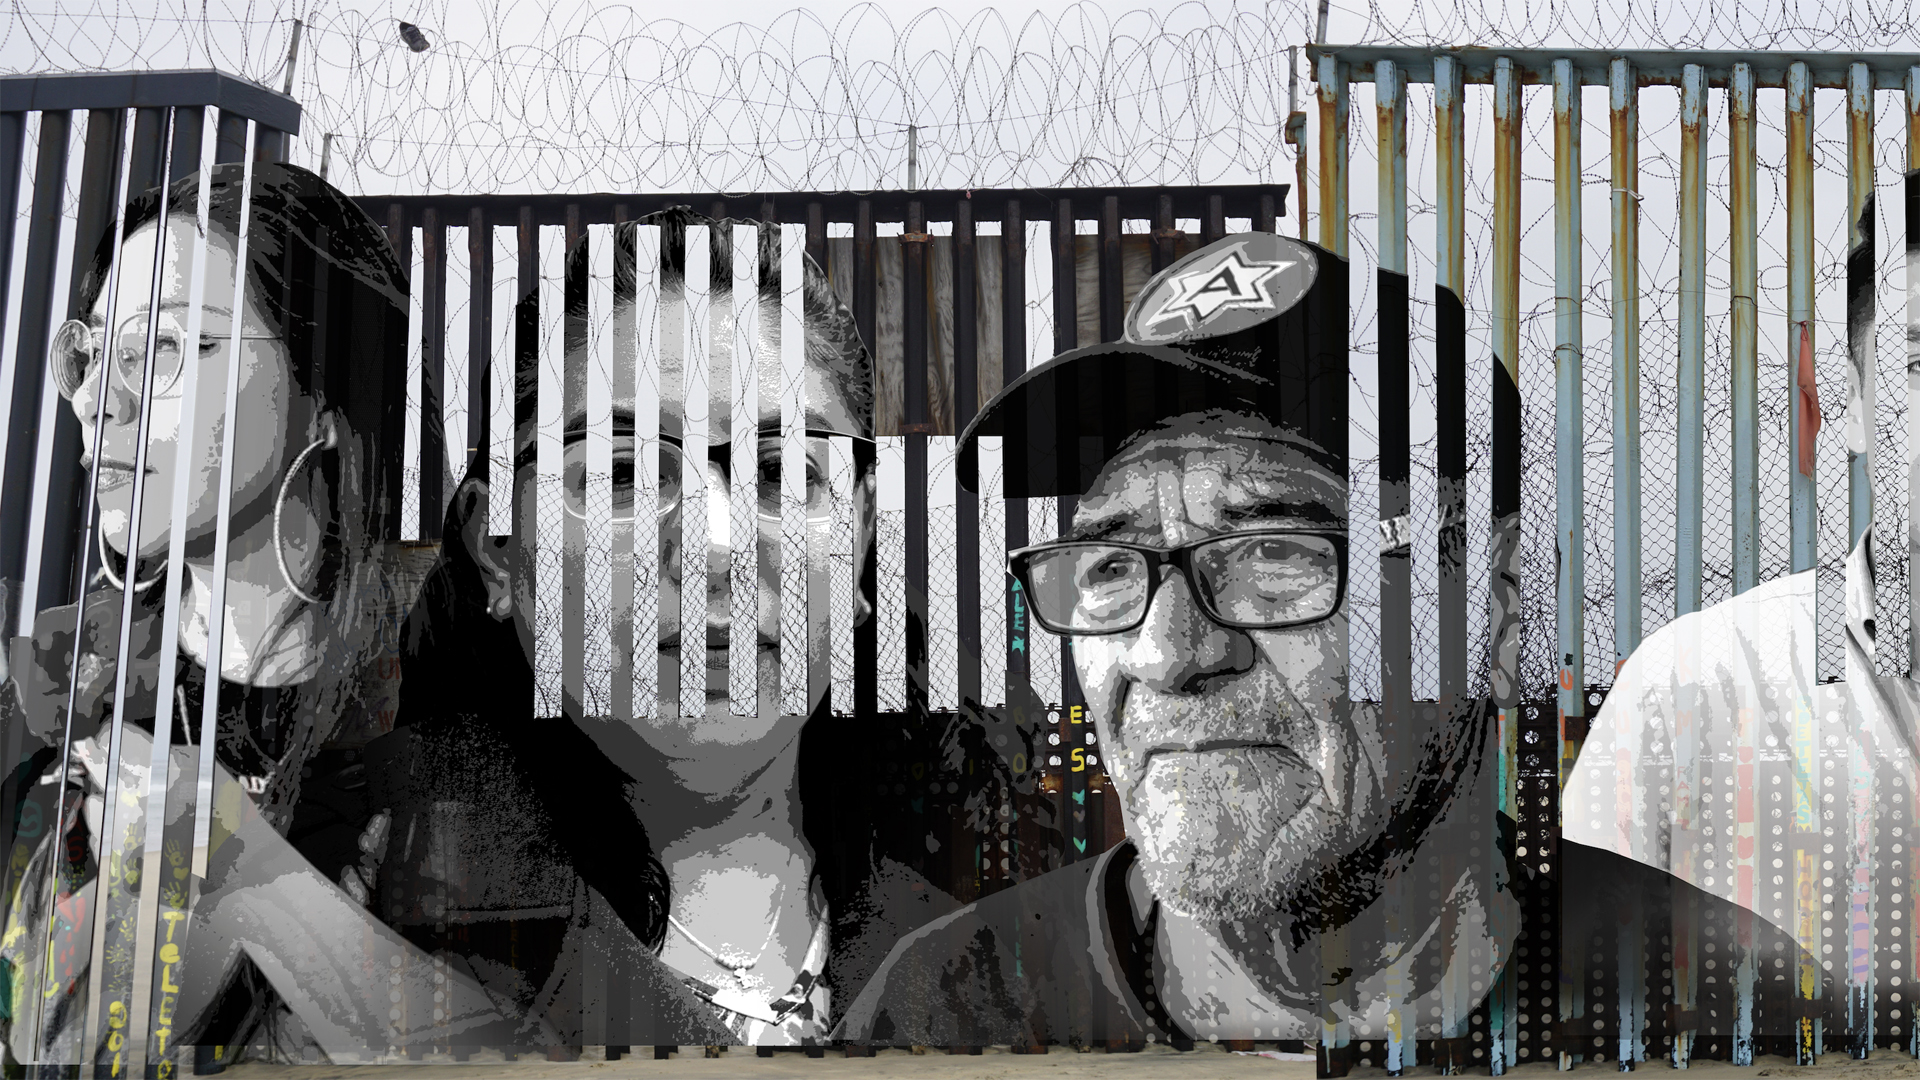 An interactive border wall project in Tijuana in August 2019 tells the stories of deported individuals. (Credit: Lizbeth De La Cruz Santana)